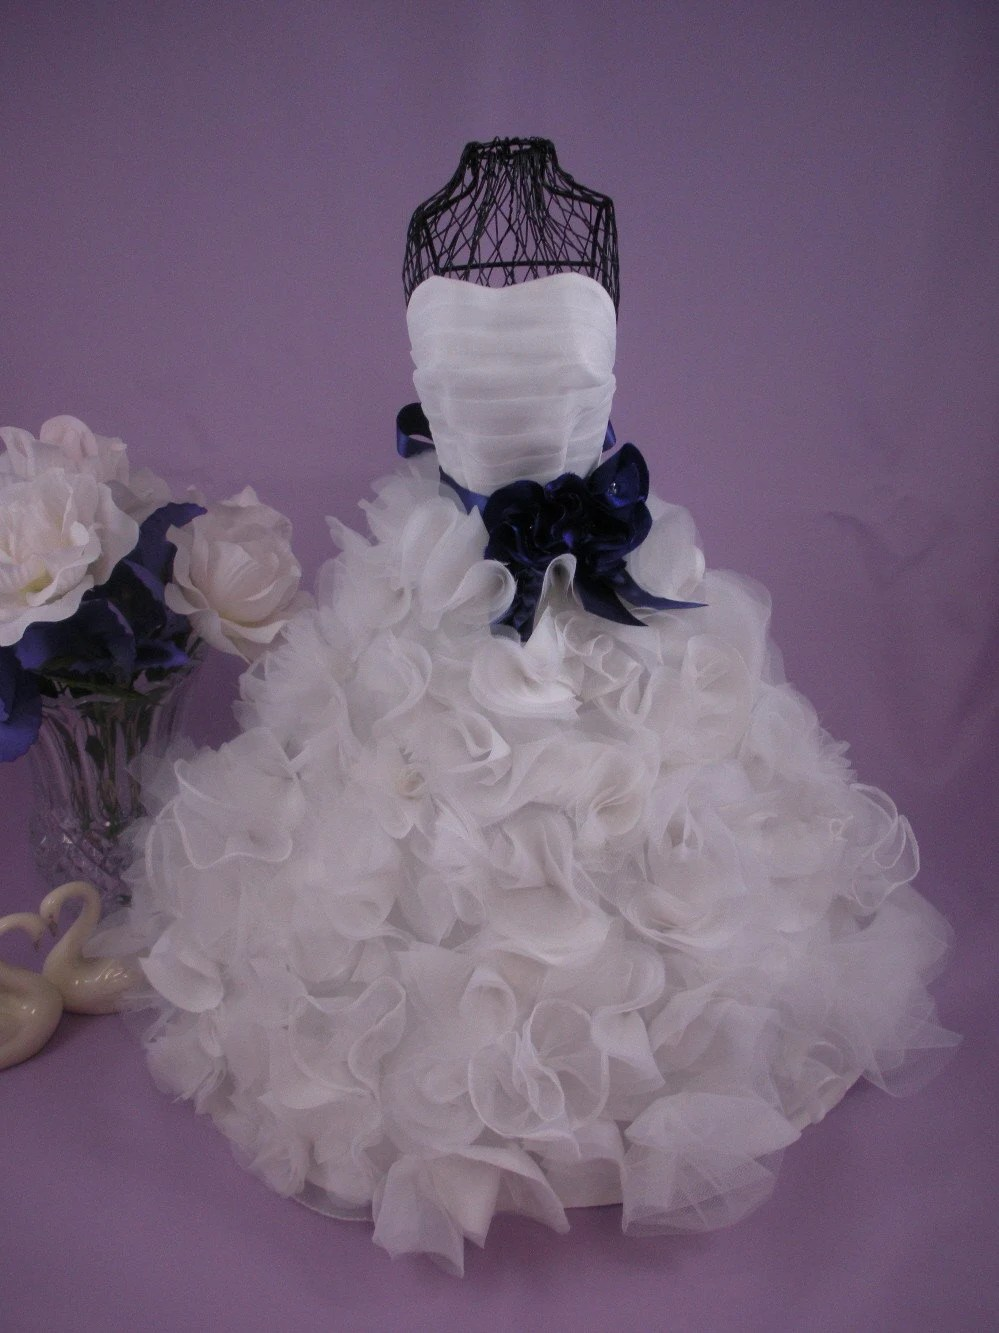 Centerpiece Custom Miniature Bridal Gown Wedding Keepsake or